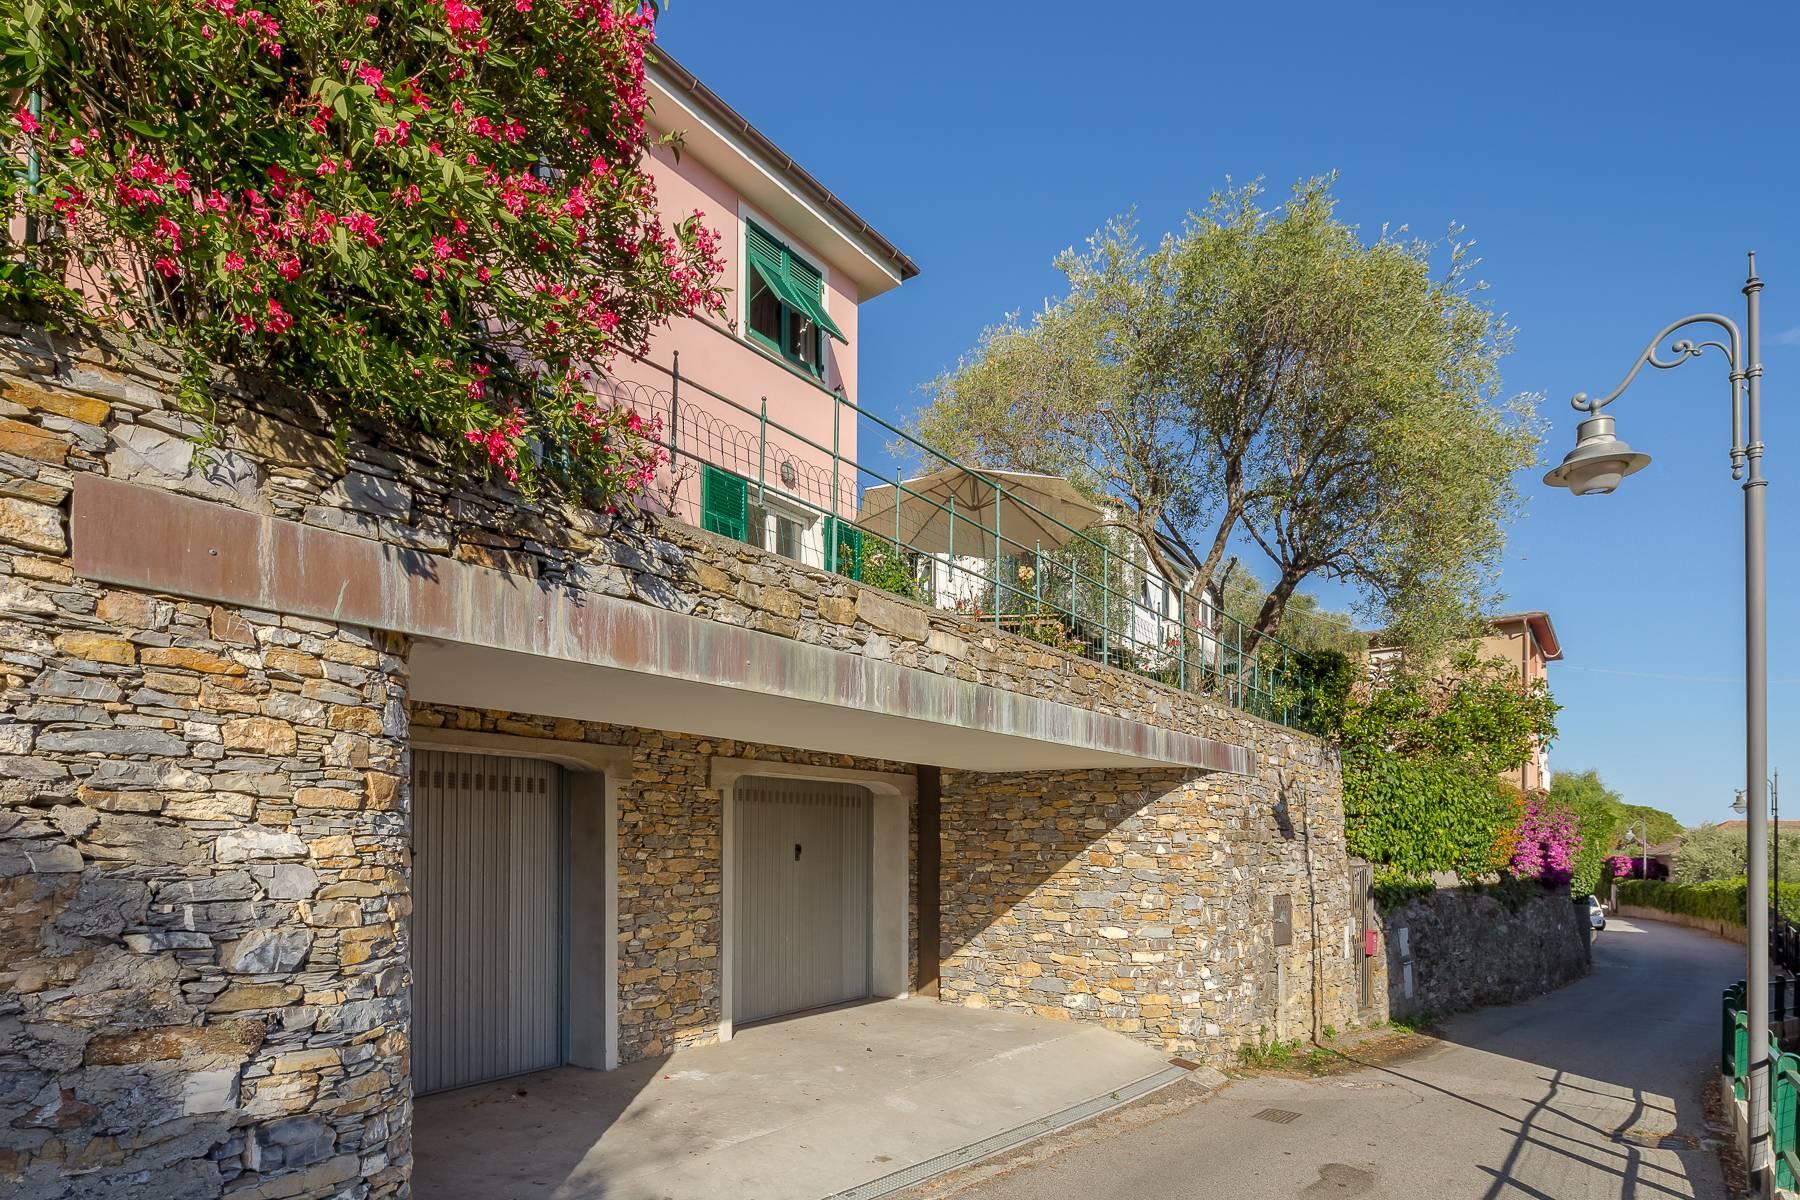 Casa indipendente in Vendita a Zoagli: 5 locali, 100 mq - Foto 30